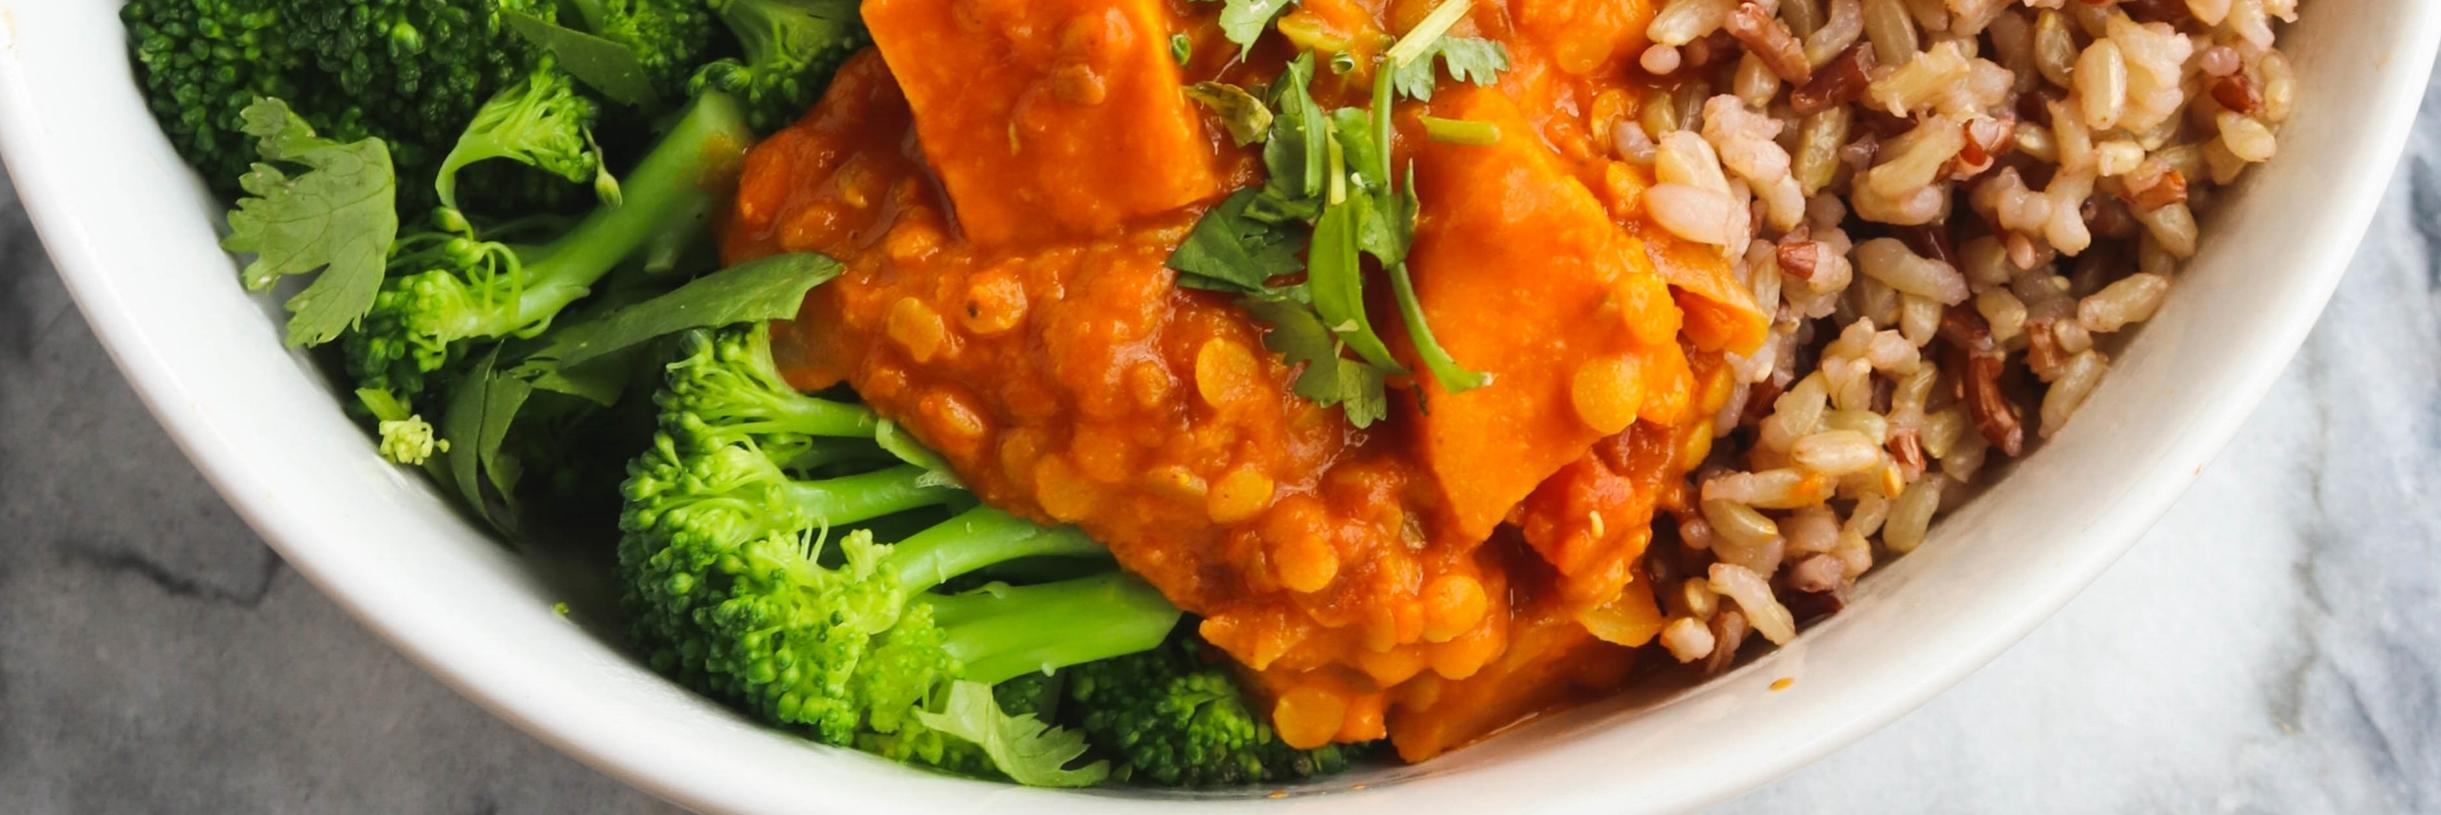 Sweet_Potato_Red_Lentil_Peanut_Stew_FromMyBowl_Vegan_Gluten_Free-5-1.jpg